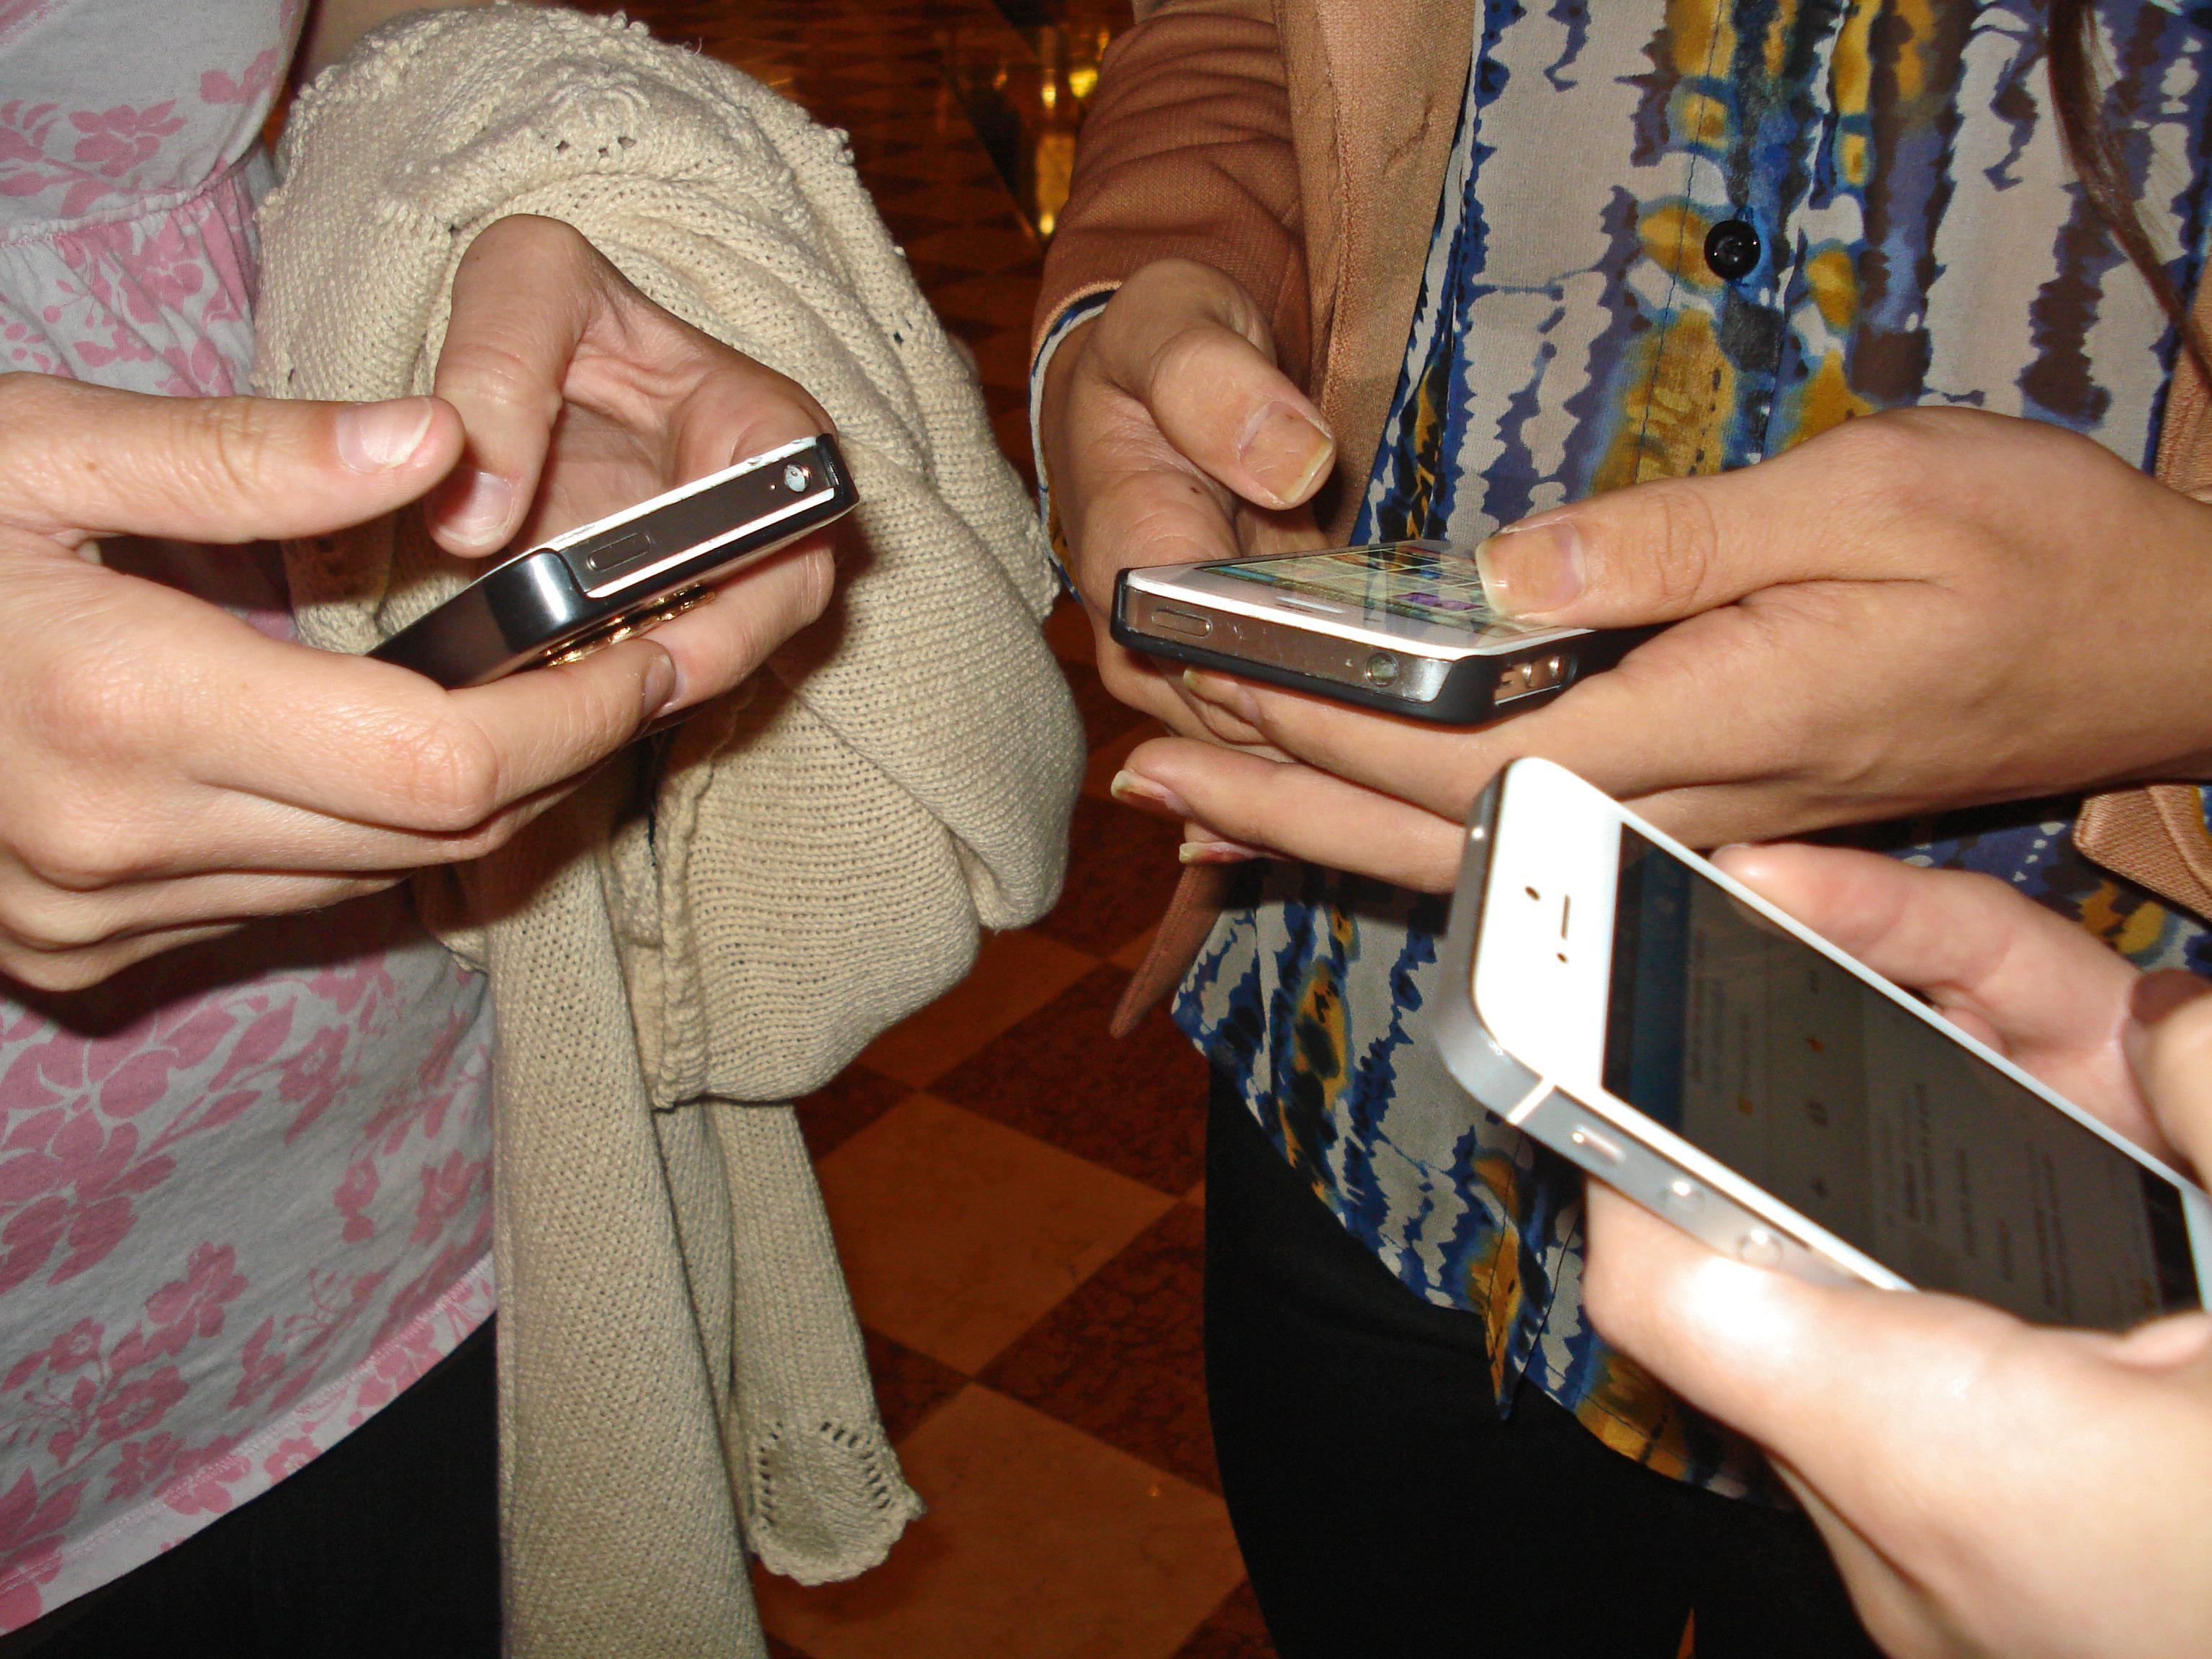 morgueFile-JessicaGale-iphones